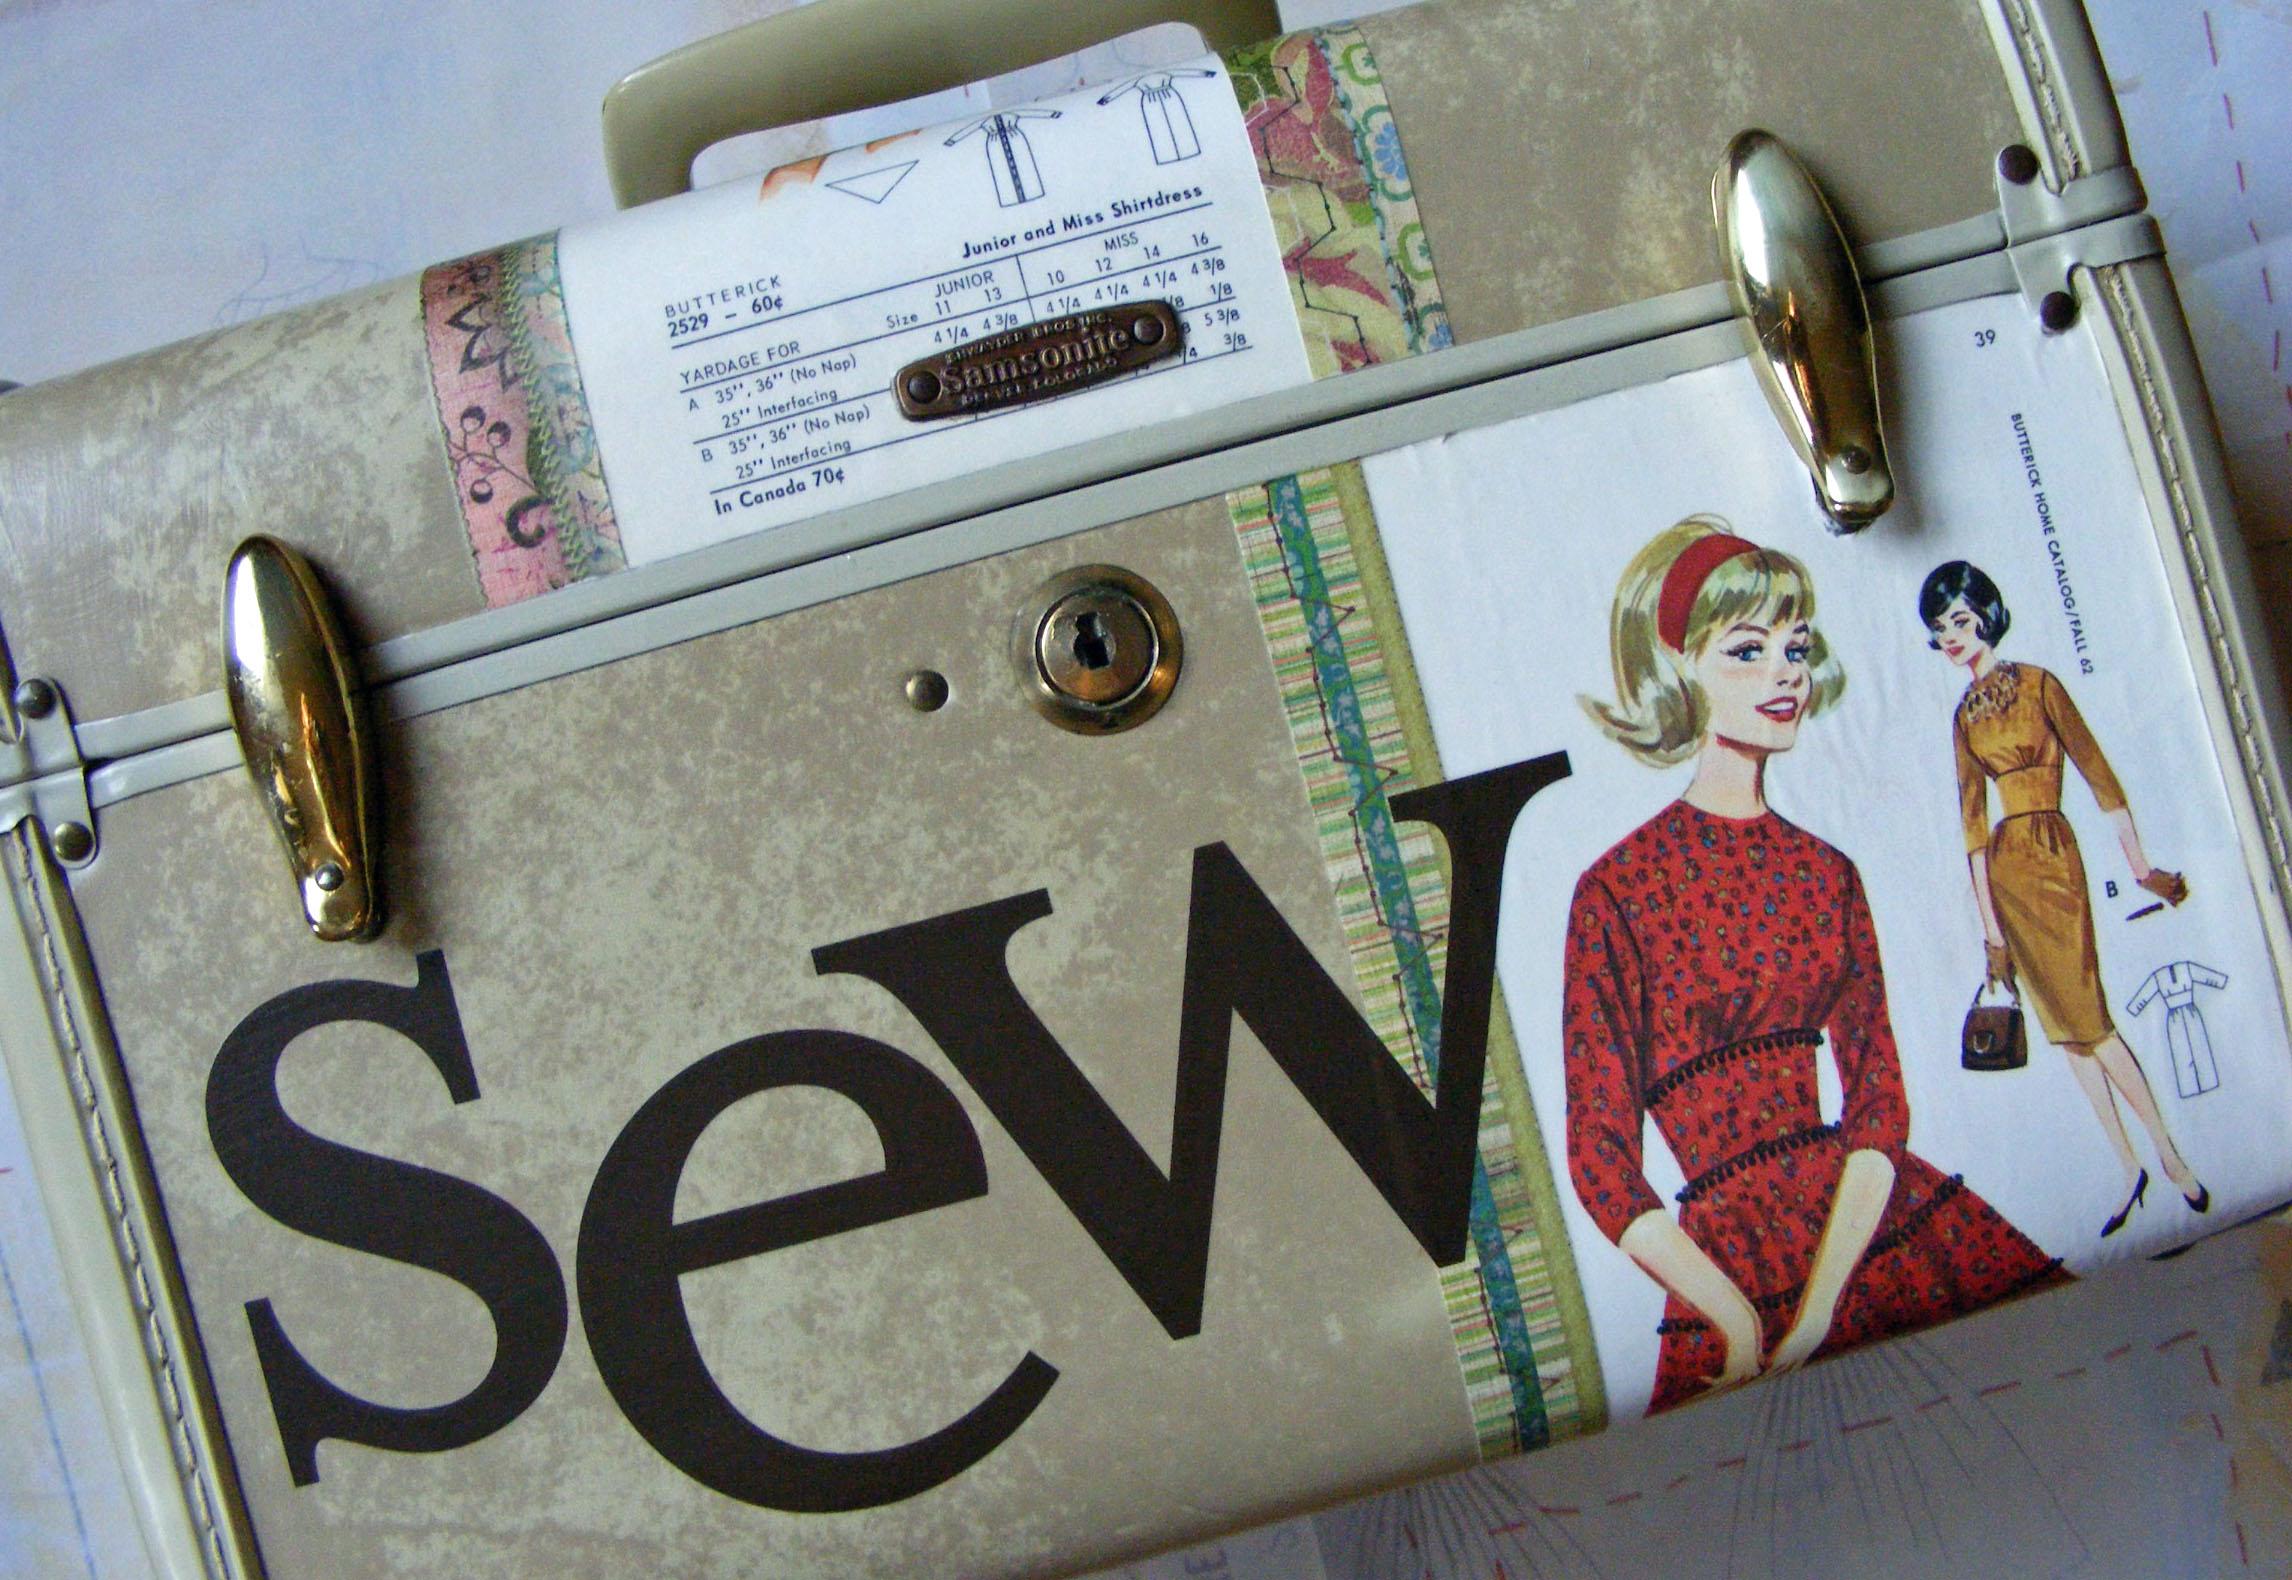 Sewcase